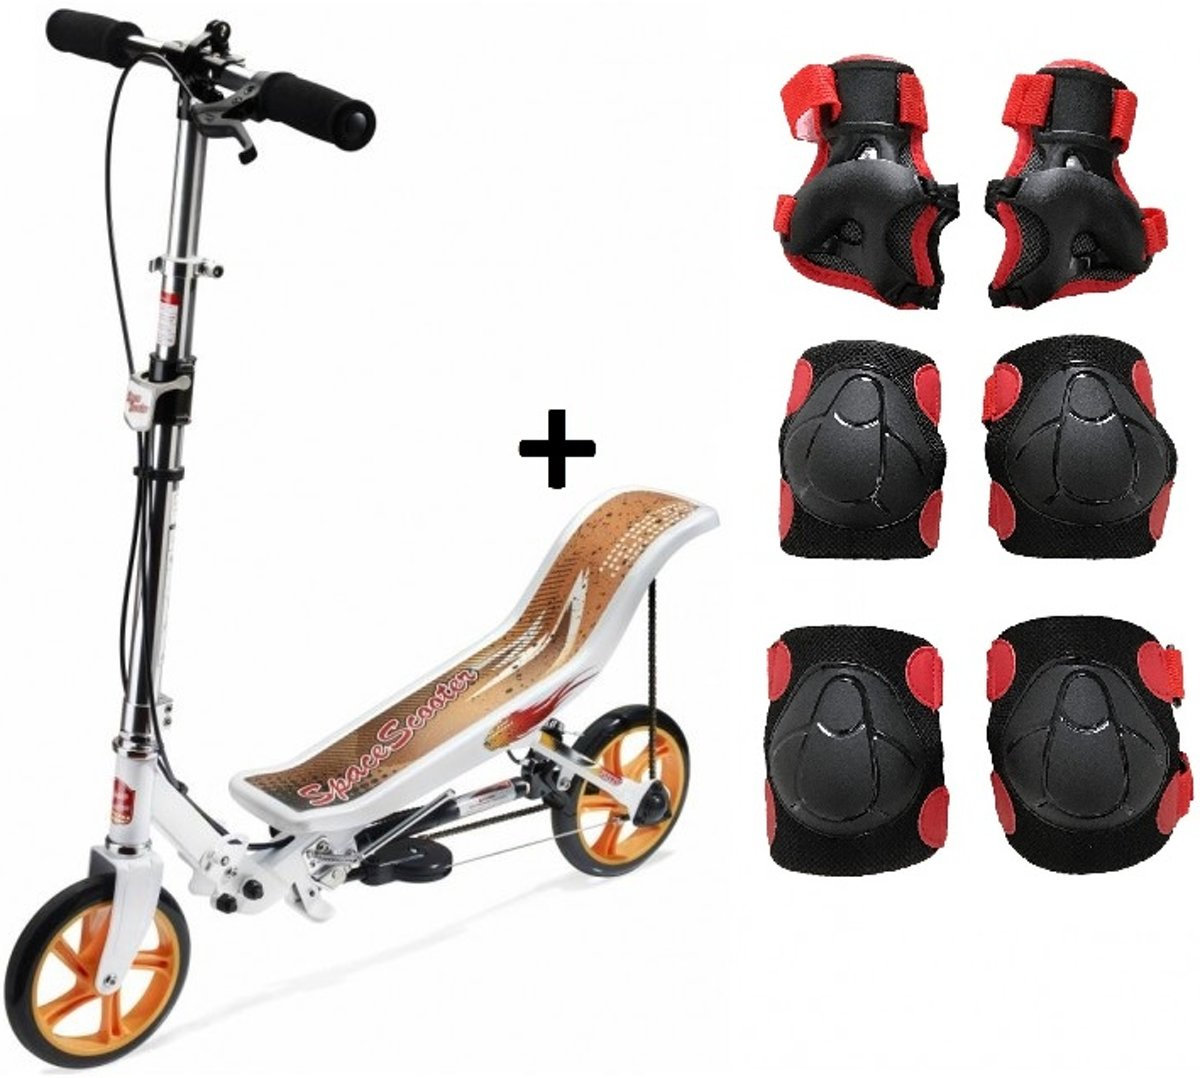 Space Scooter - Step - Wit incl. beschermset